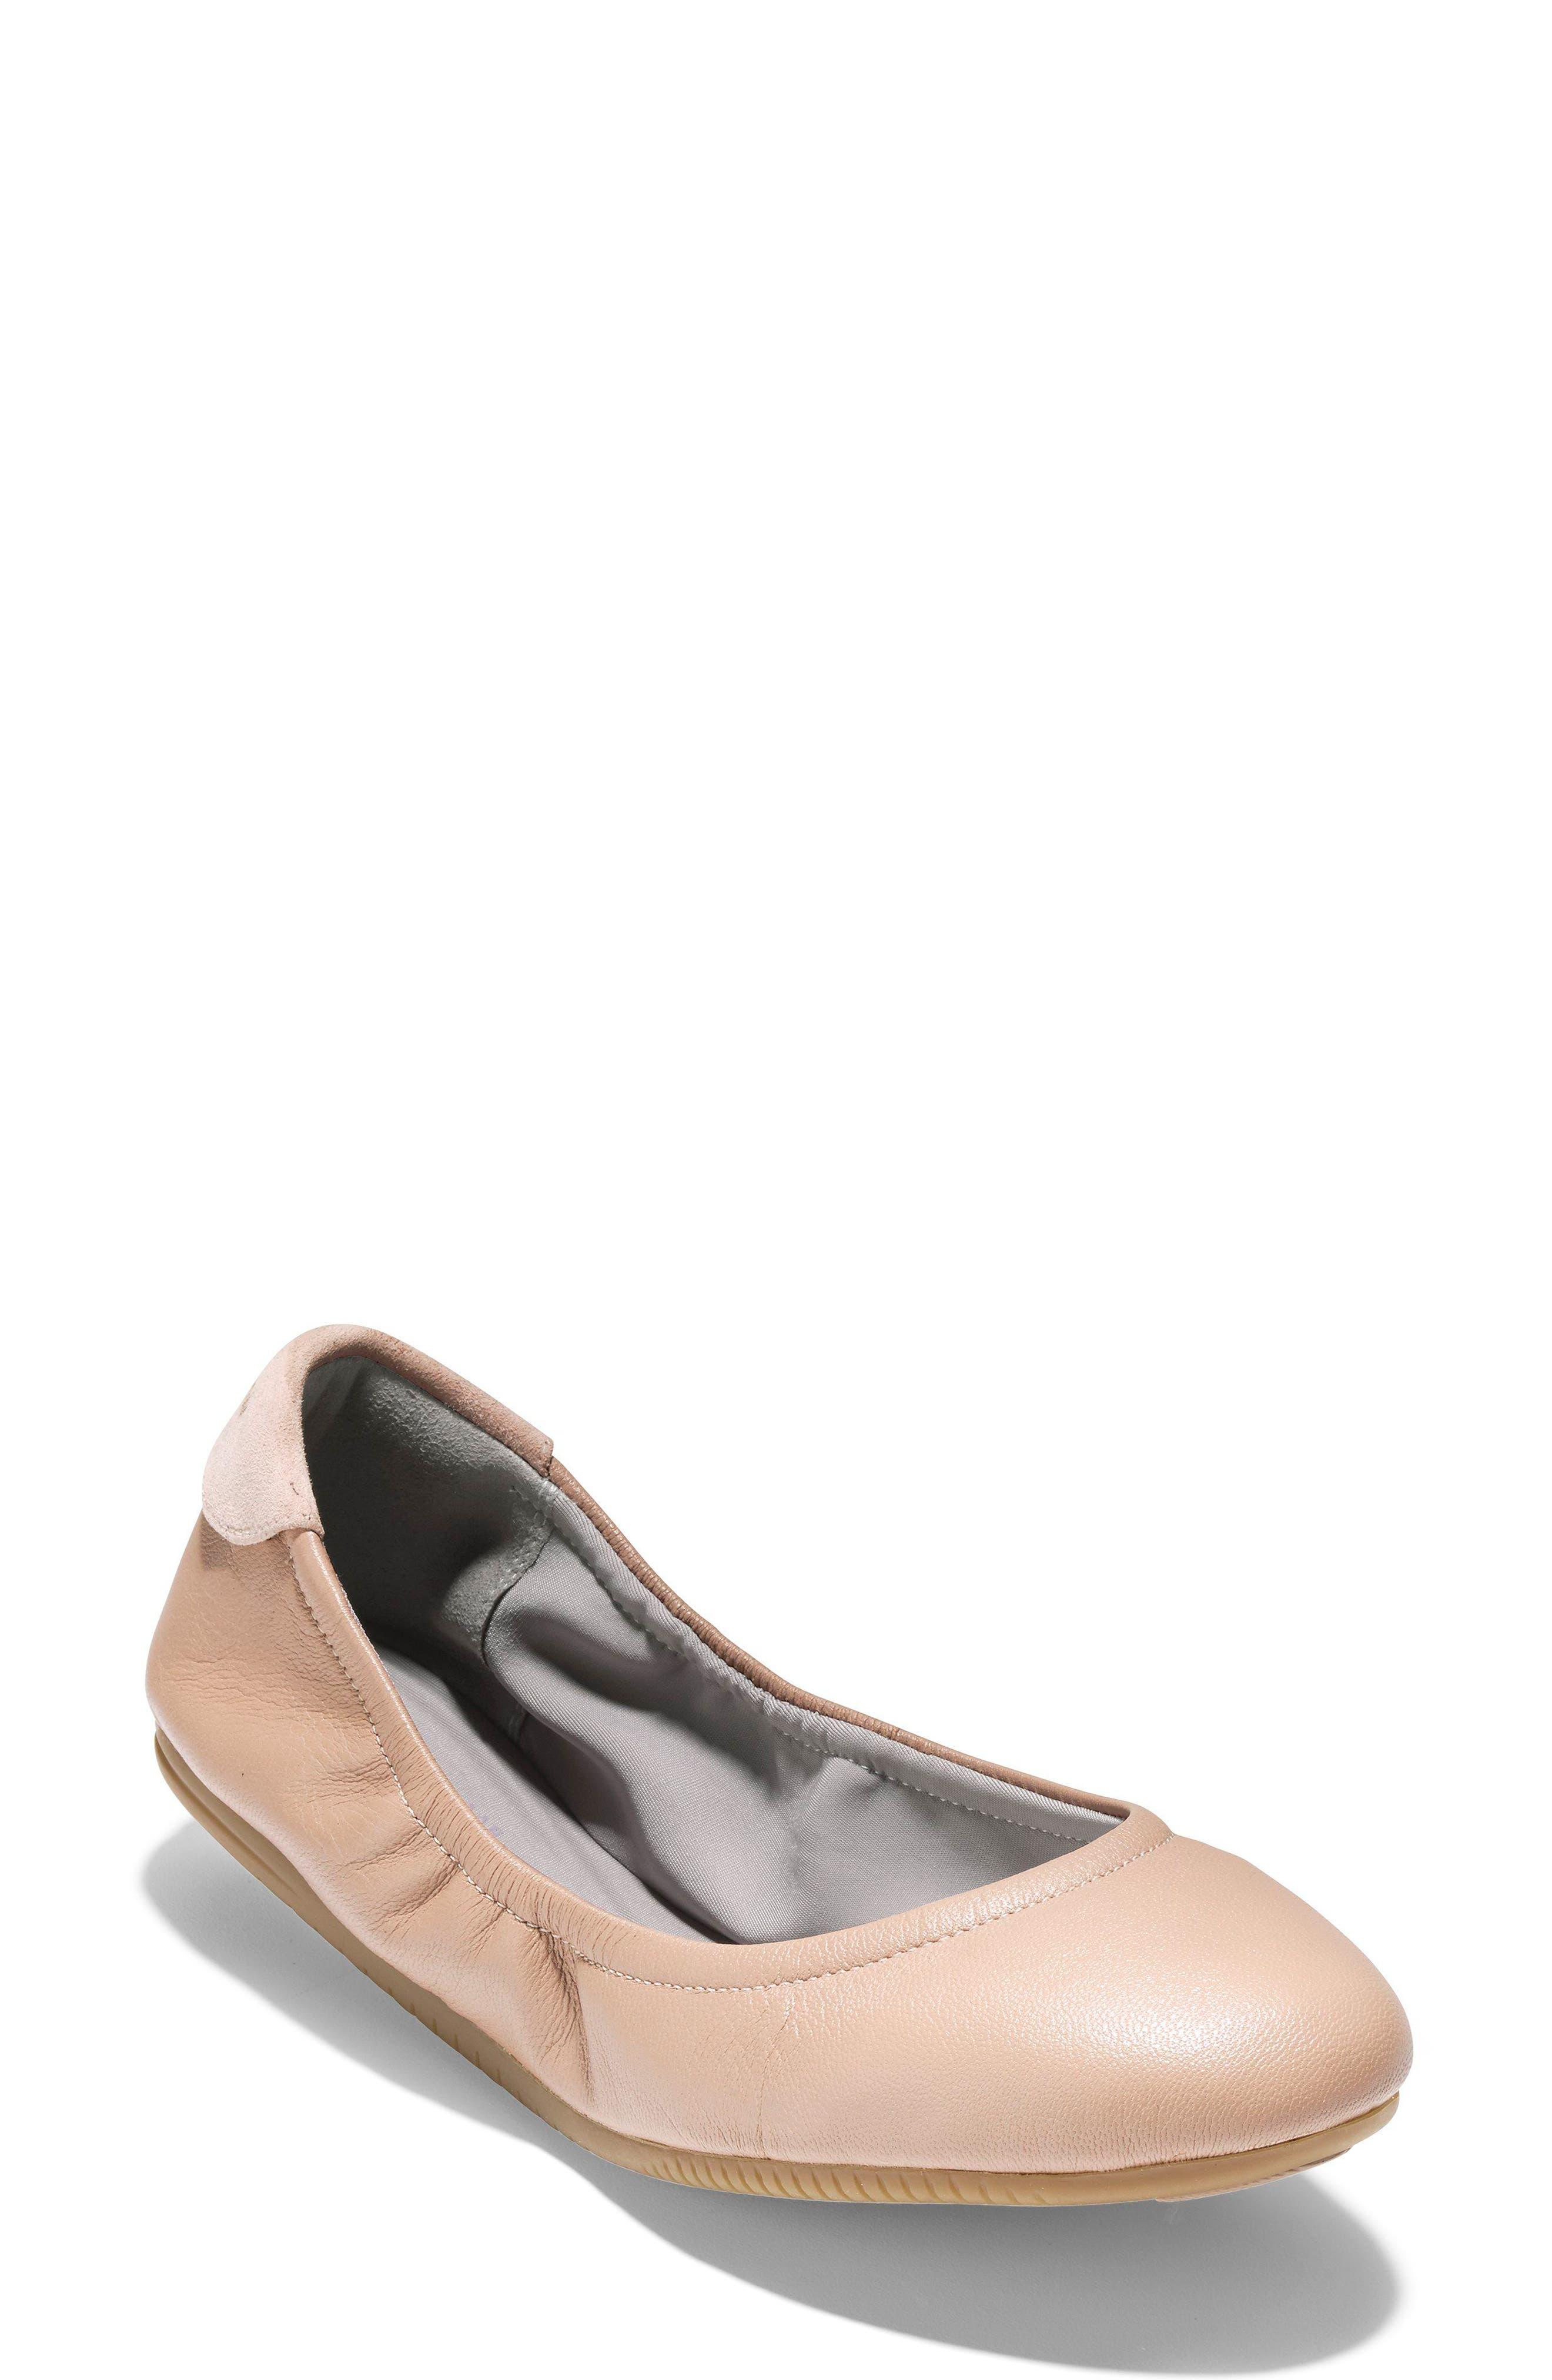 Studiogrand Ballet Flat,                             Main thumbnail 1, color,                             Maple Sugar Leather